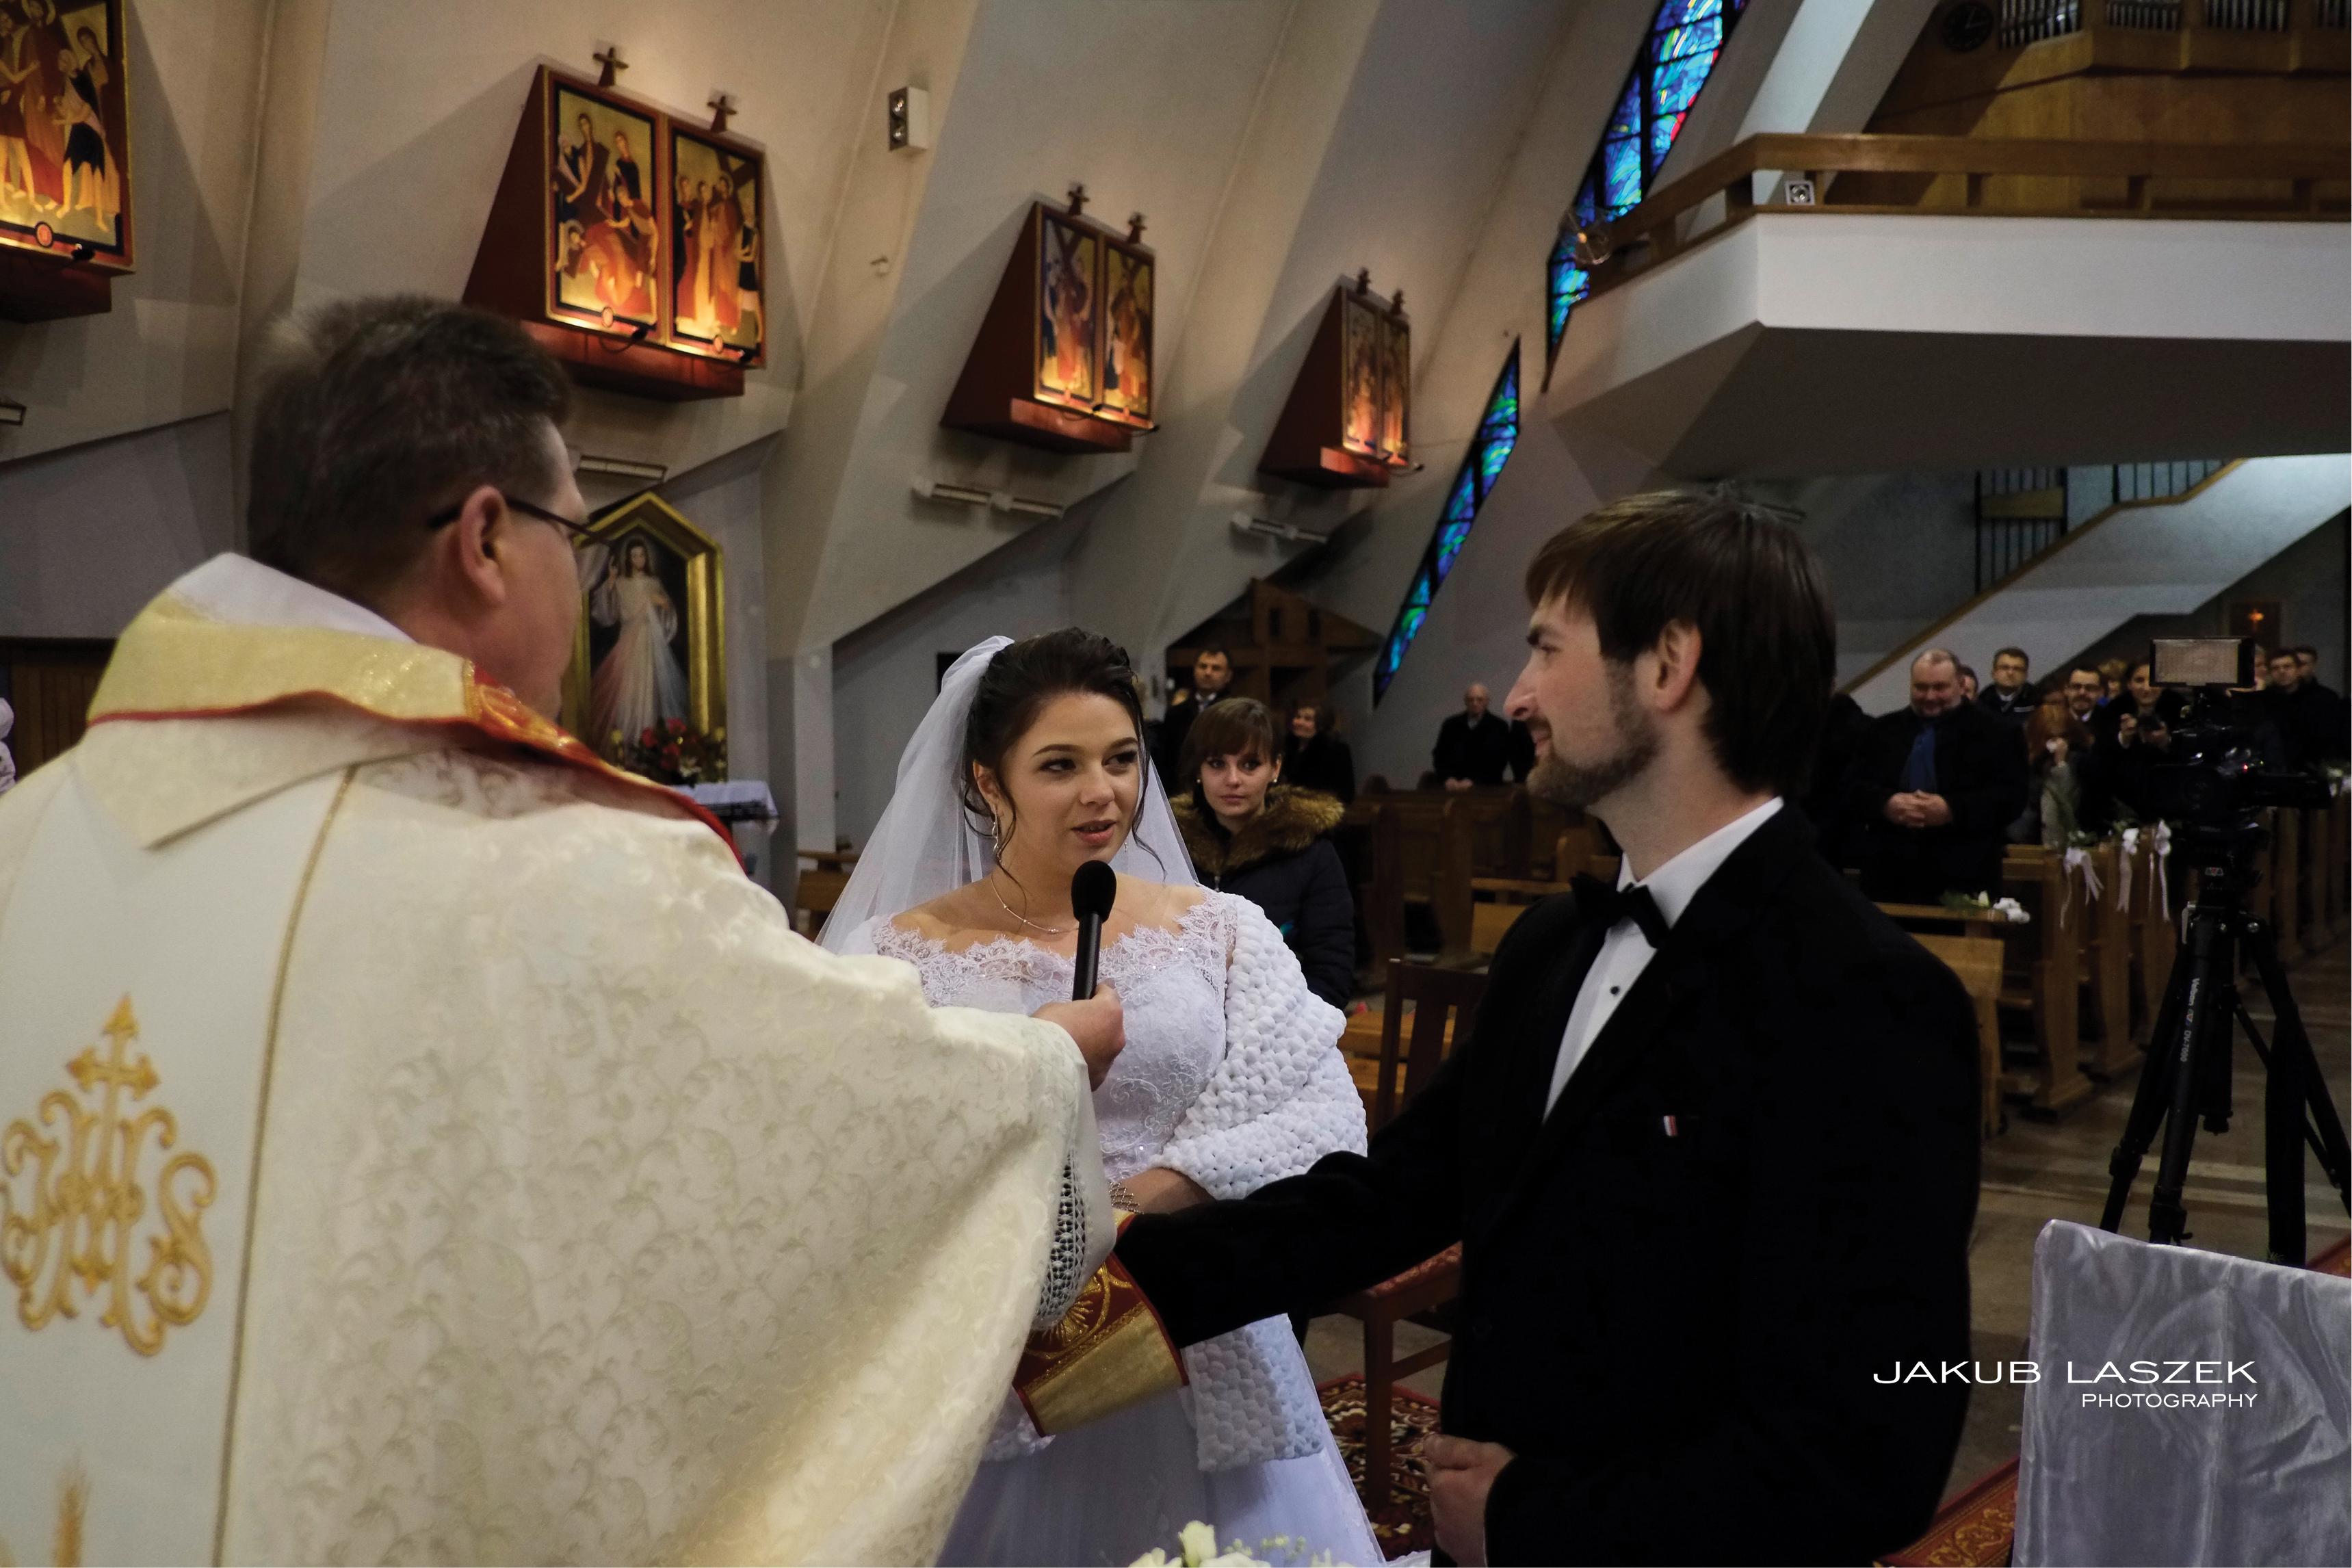 tarnow_fotograf_slubny_wedding_photographer16